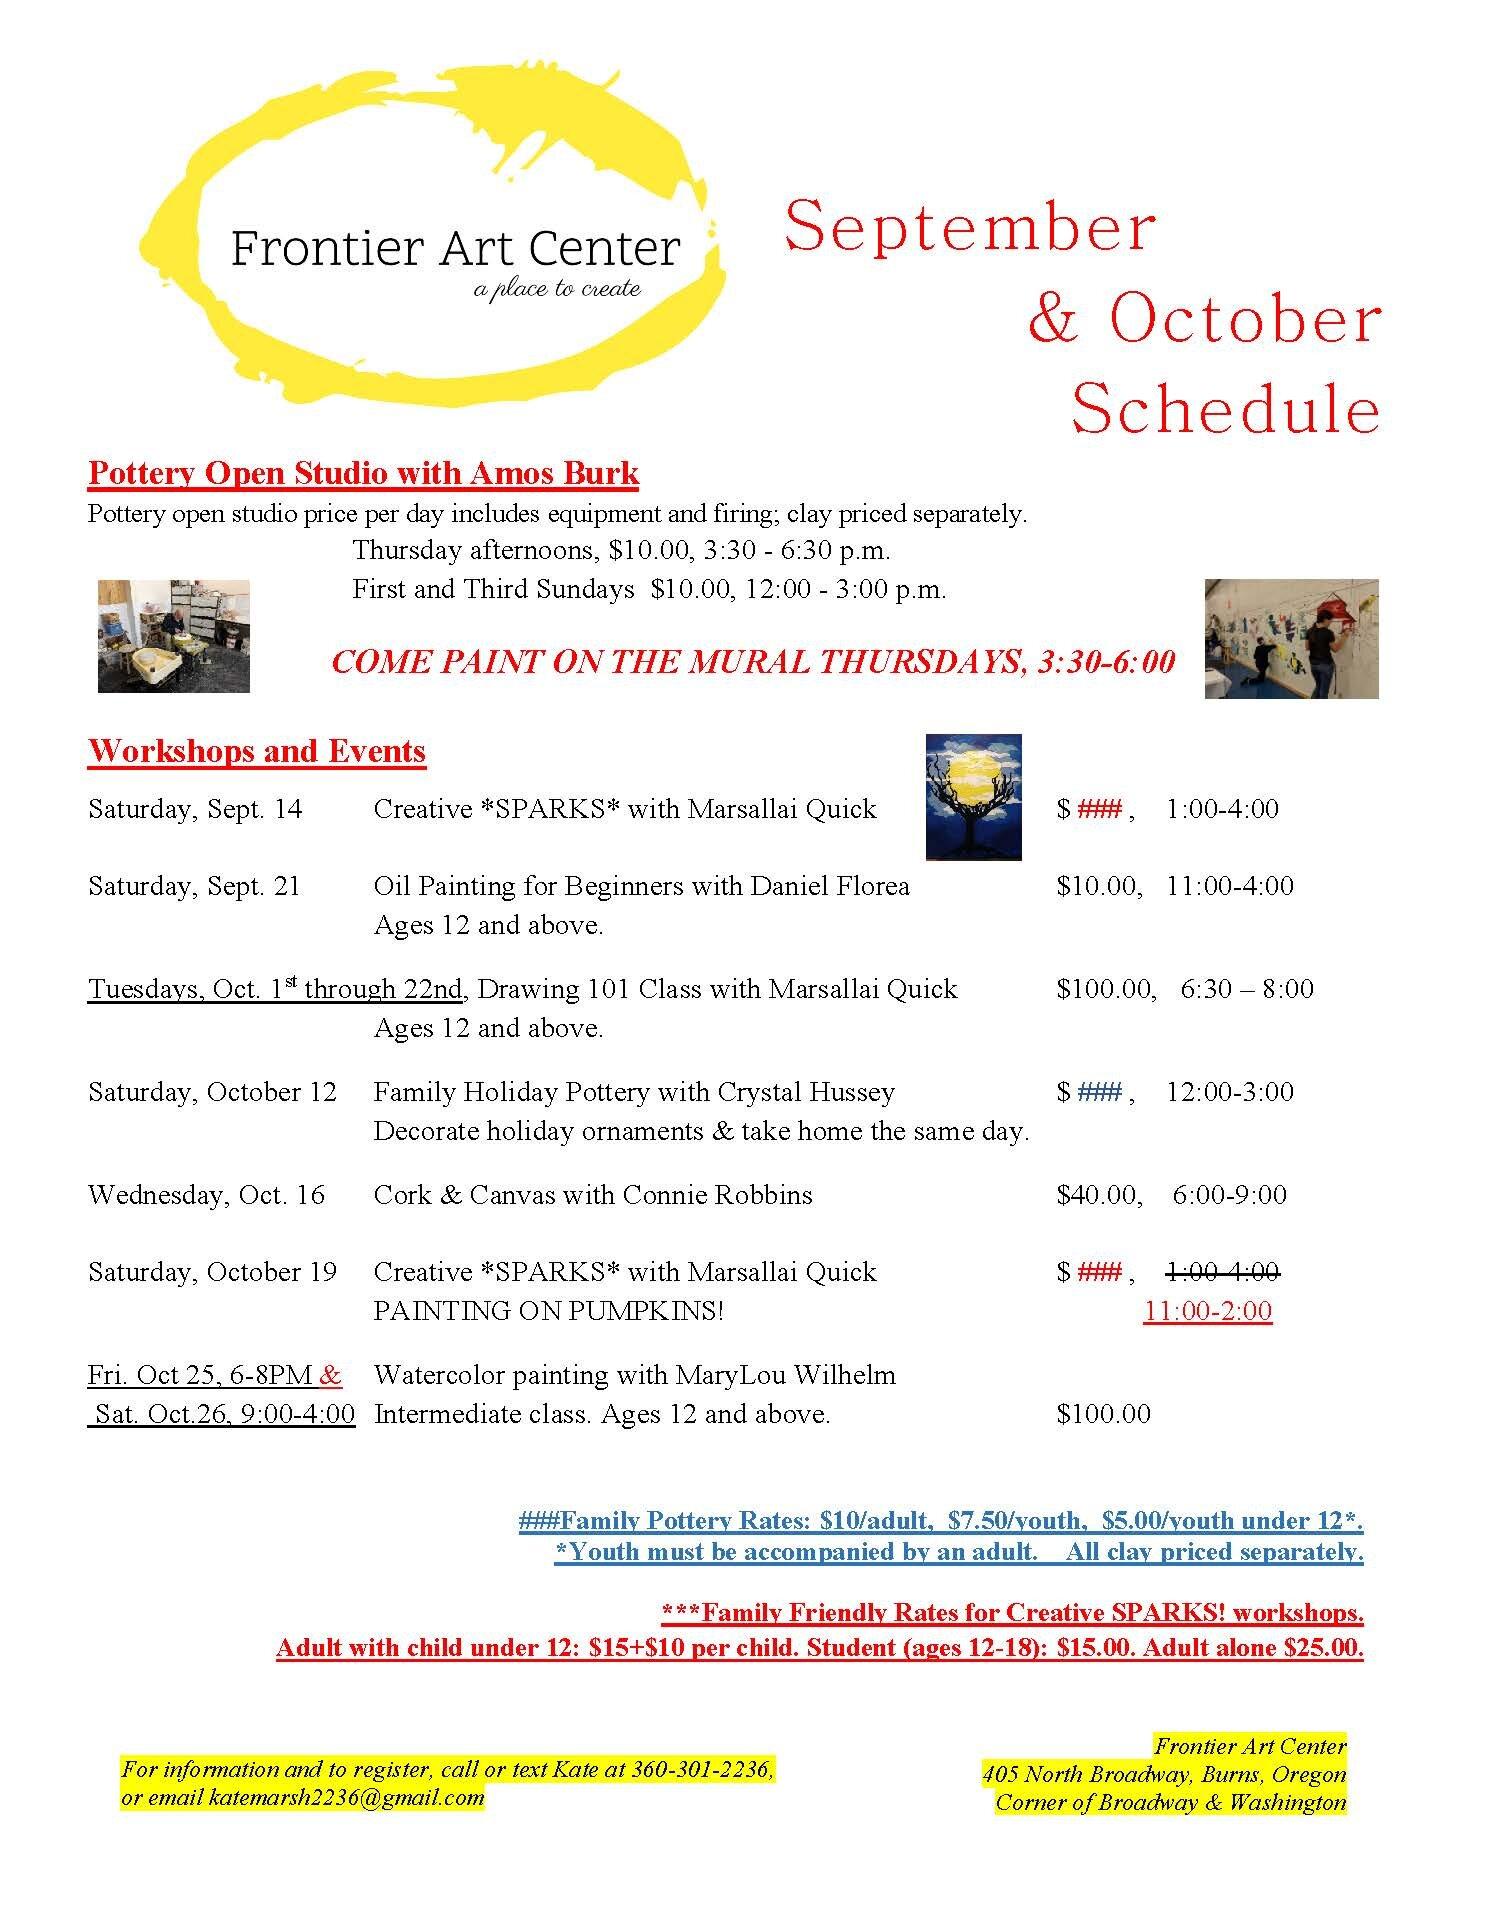 FAC Schedule Sept. - October 2019, REV.jpg